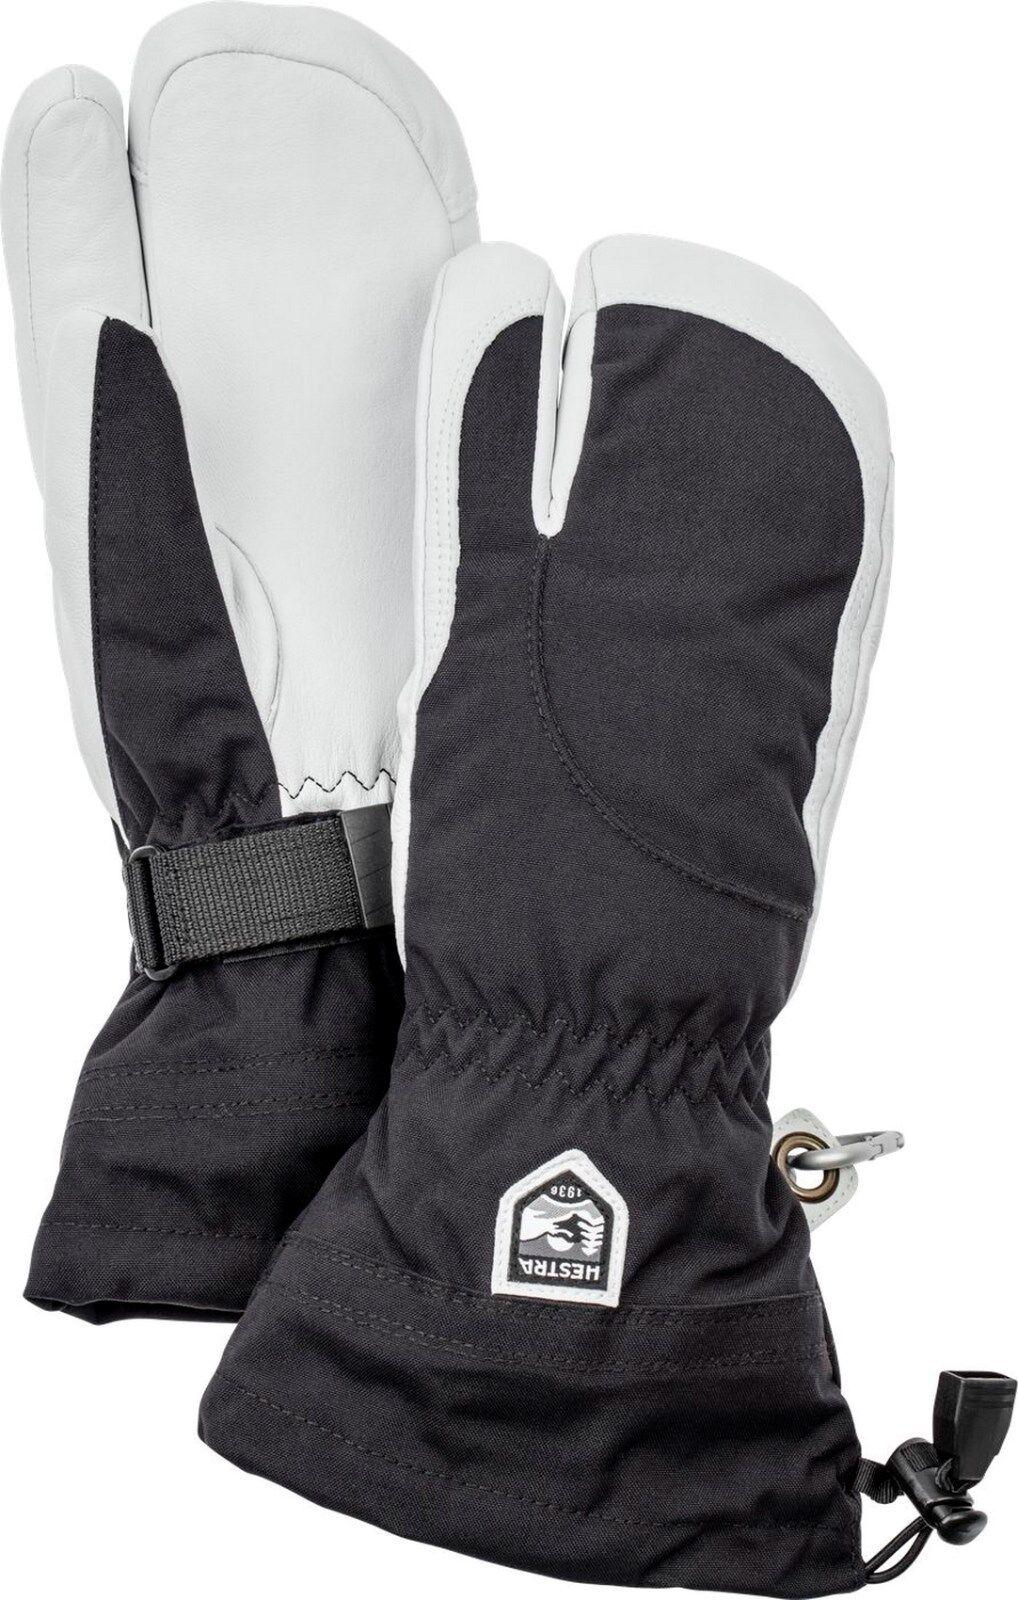 HESTRA Damen Leder Skihandschuh Heli Ski Woman 3 Handschuh Hestra NEU